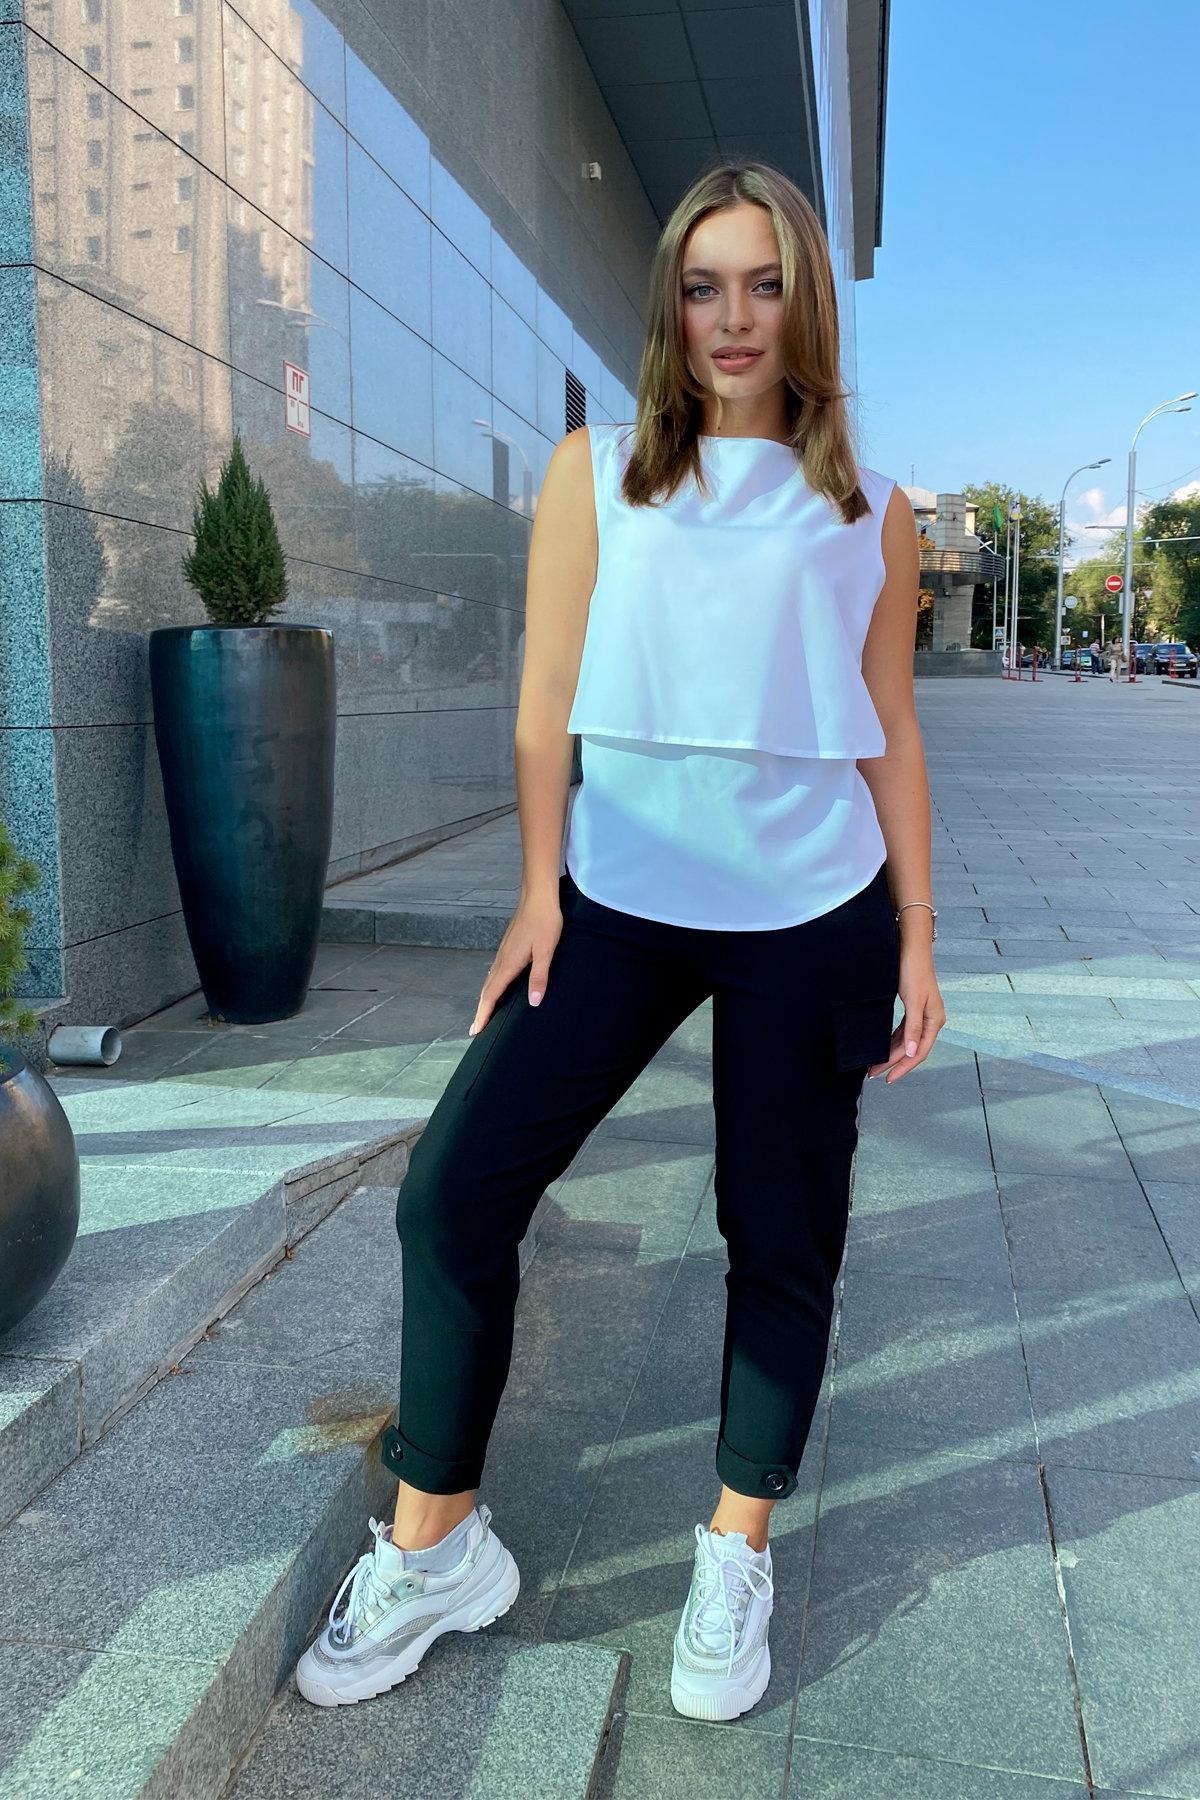 Блуза Арома Лайт 8835 АРТ. 45151 Цвет: Белый - фото 5, интернет магазин tm-modus.ru